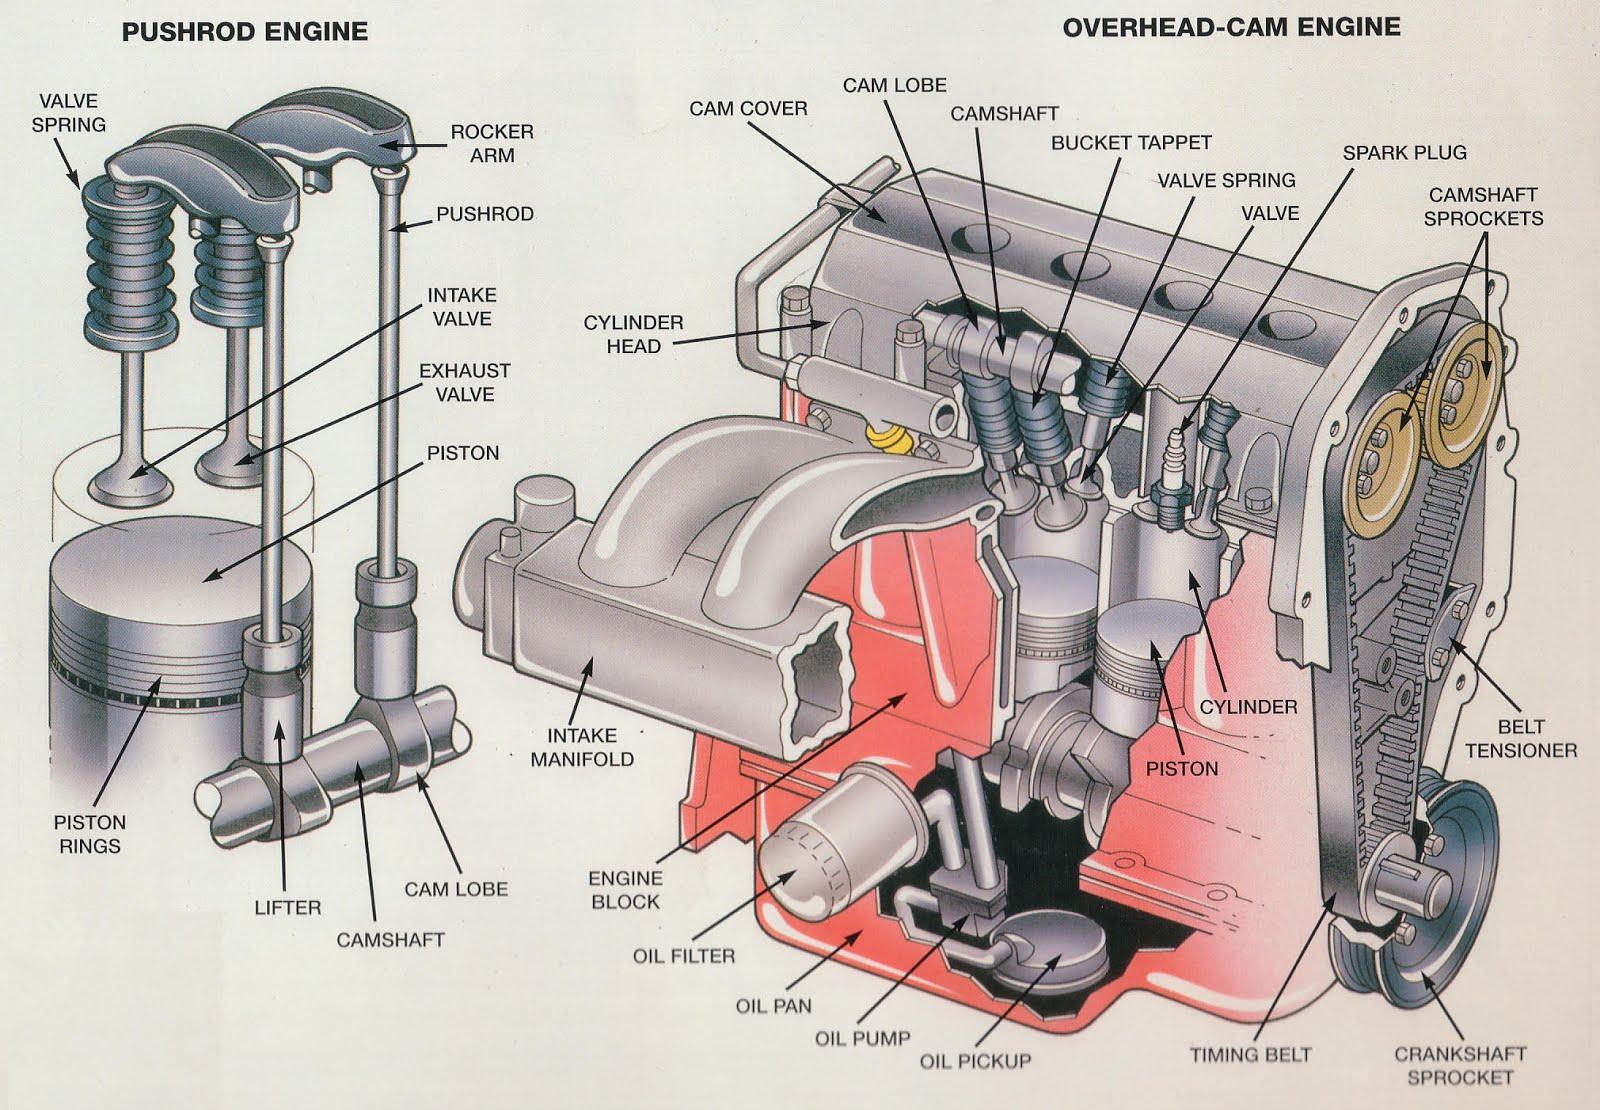 hight resolution of single overhead cam engine diagram cylinder piston engine flathead motor overhead valve engine diagram